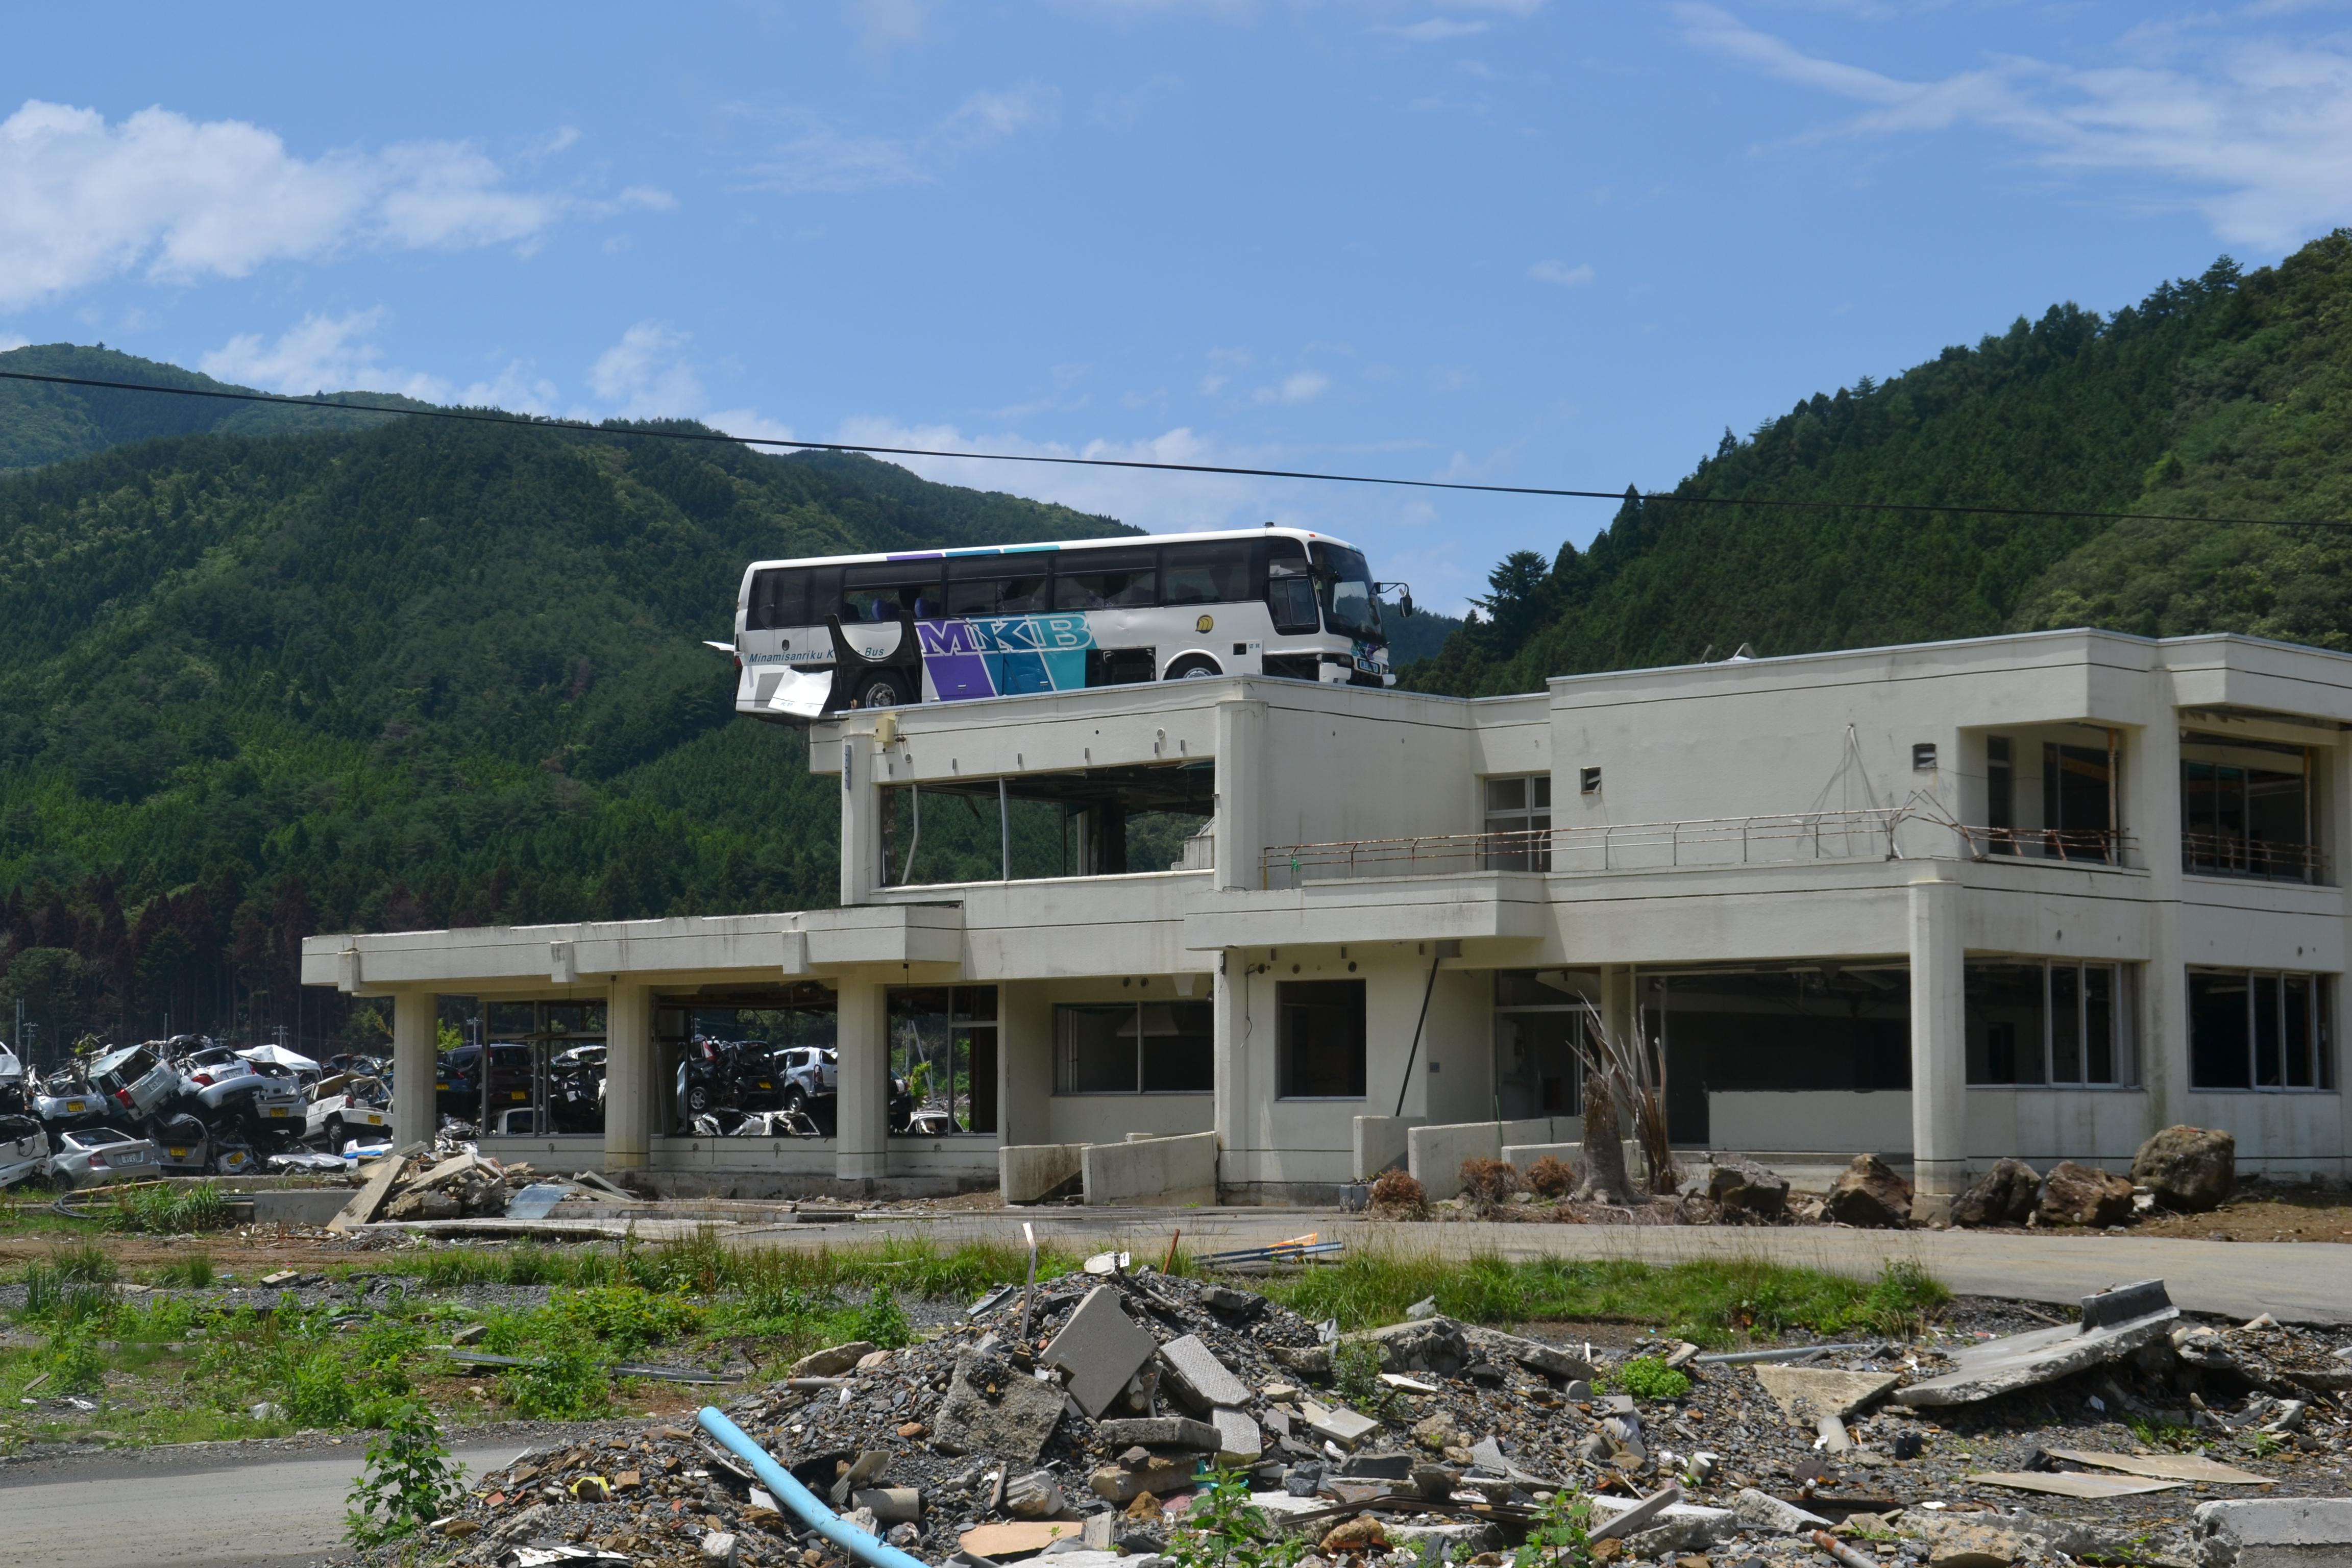 onagawa bus on top of building.JPG